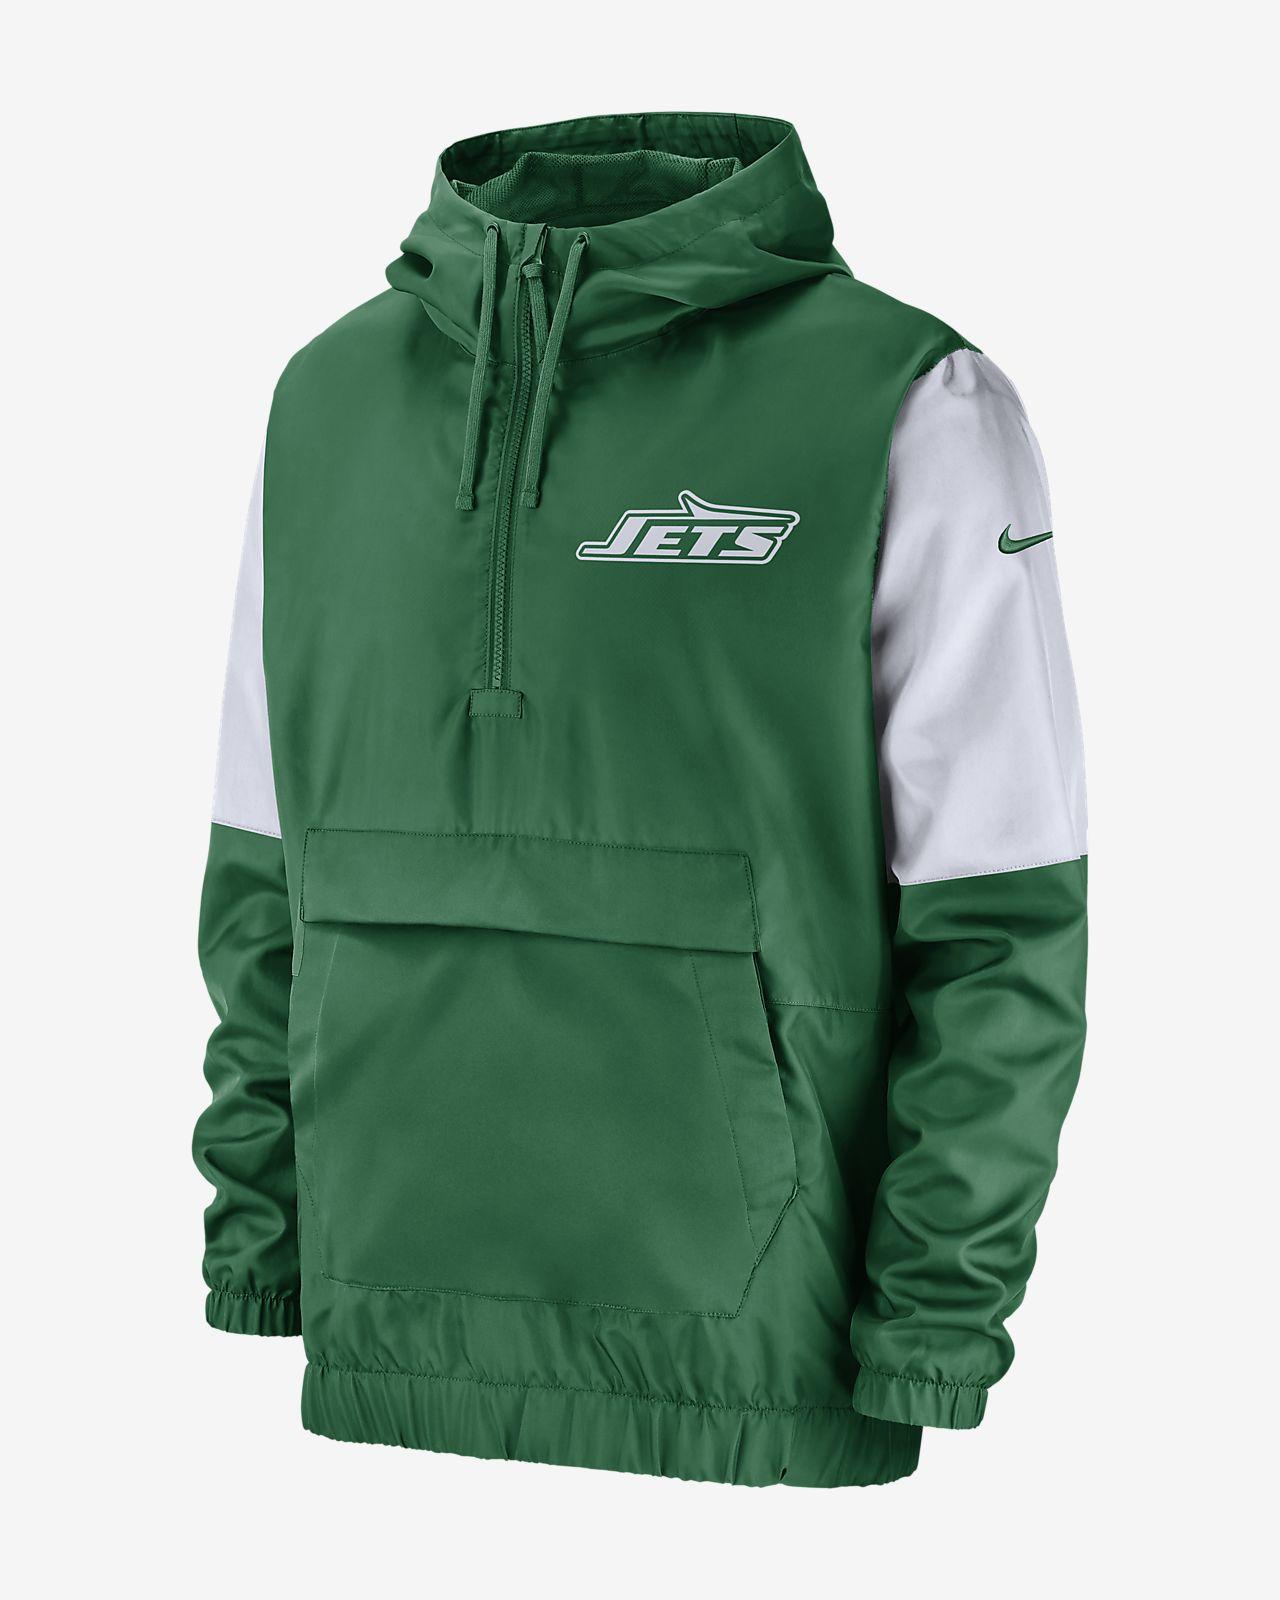 meet 43cb7 b37f4 Nike Anorak (NFL Jets) Men's Jacket